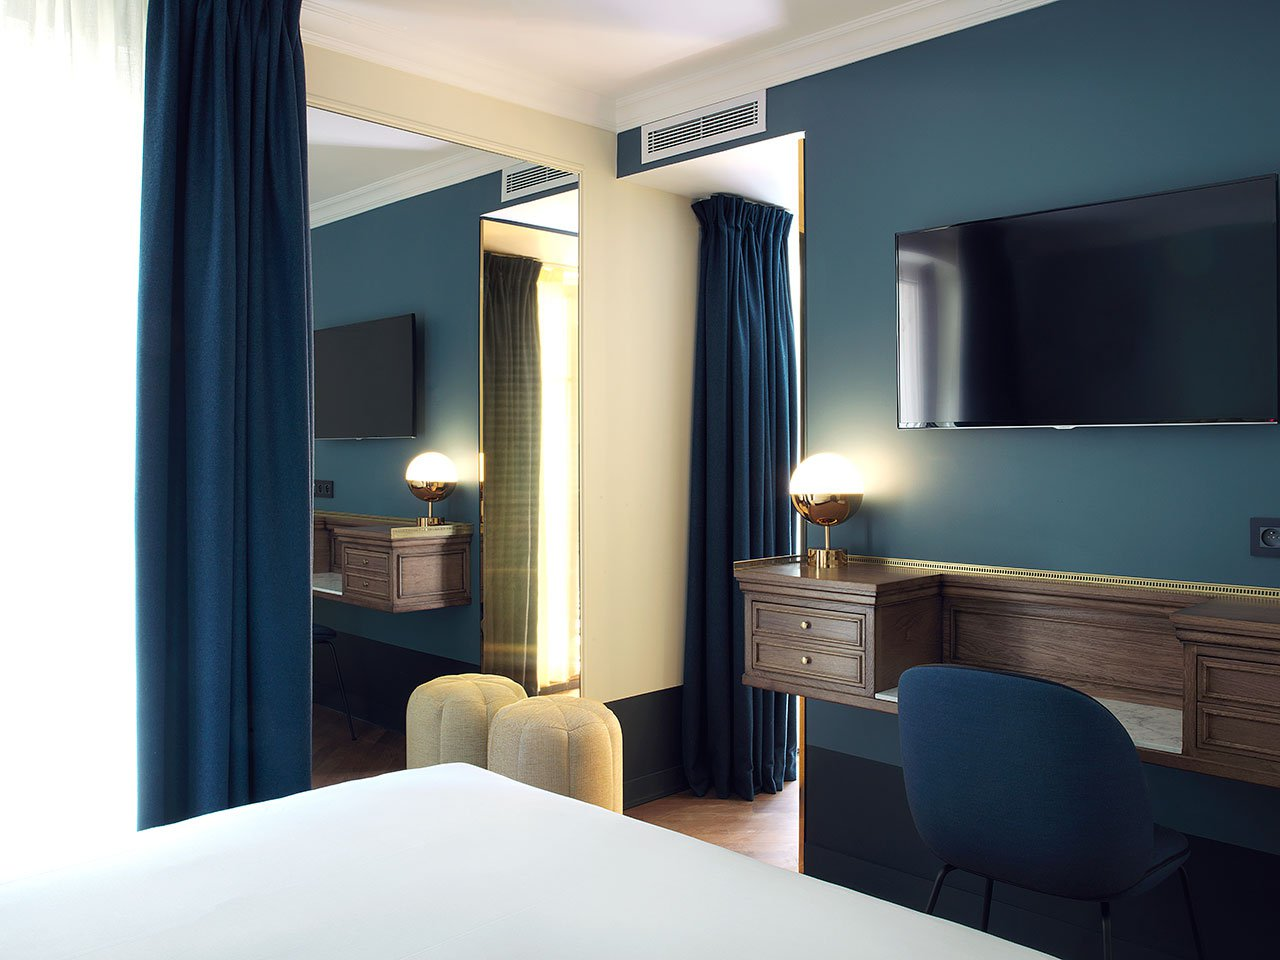 f3_hotel_bachaumont_paris_photo_paul_bowyer_yatzer